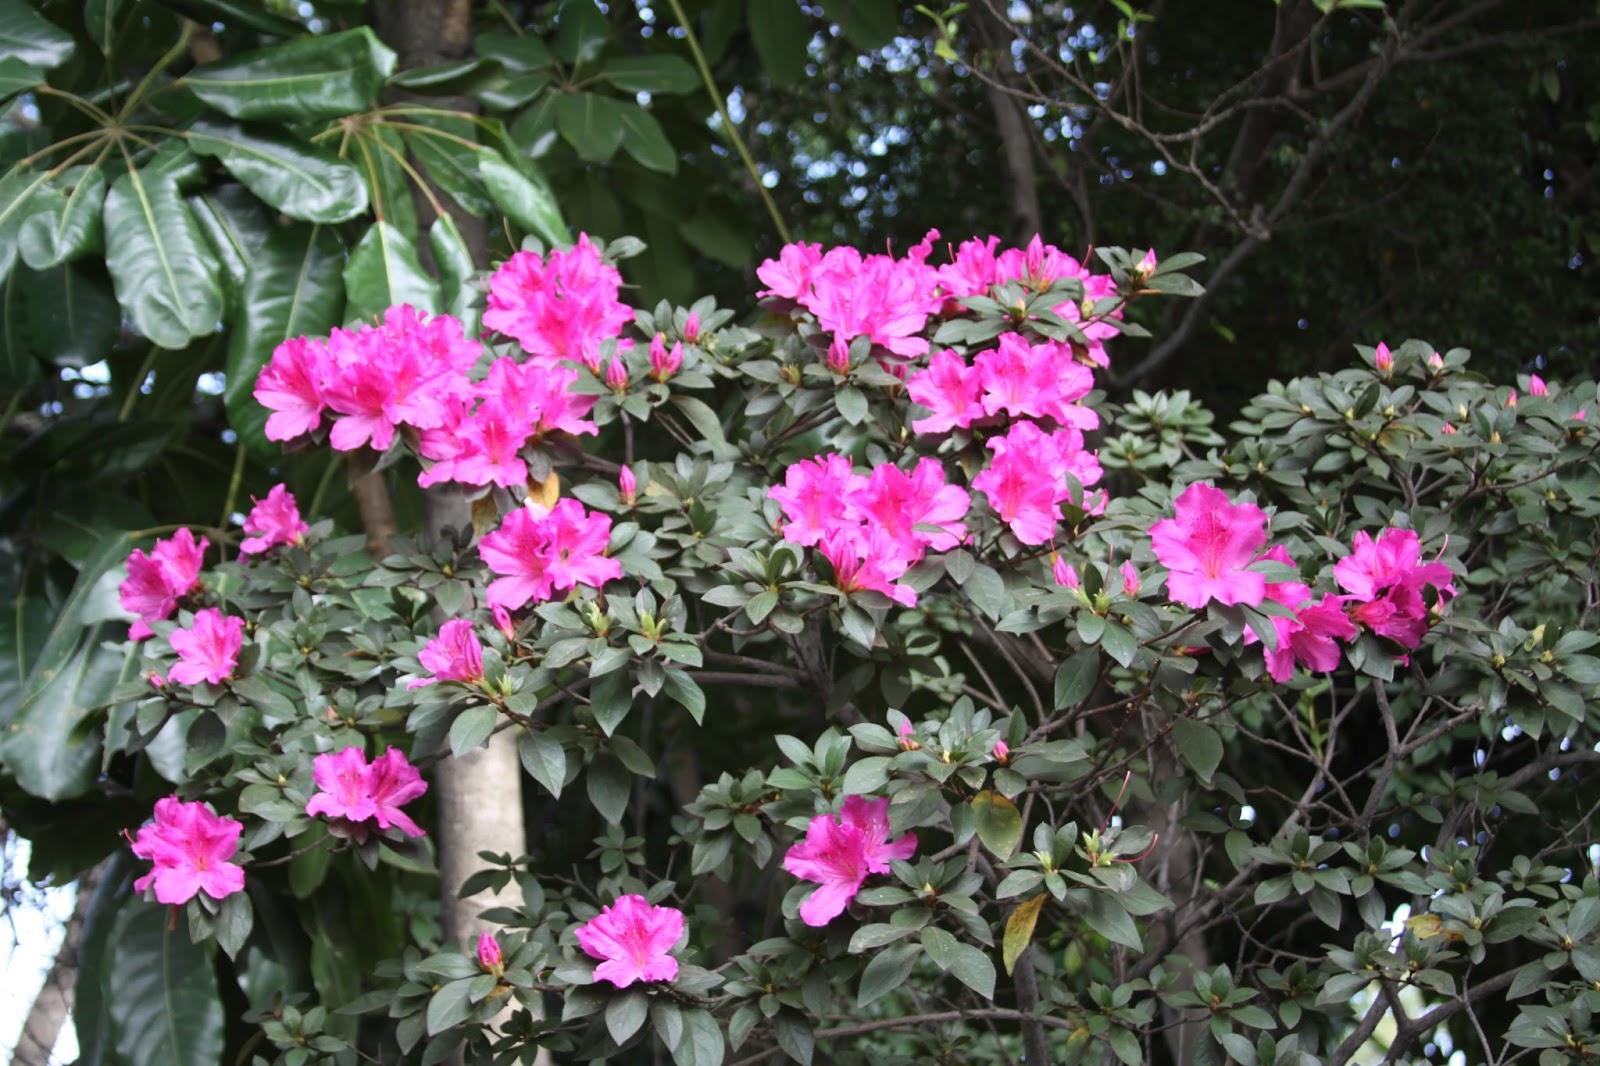 Desabrochar no inverno destaca azaleia como flor do m s - Azalea cuidados planta ...